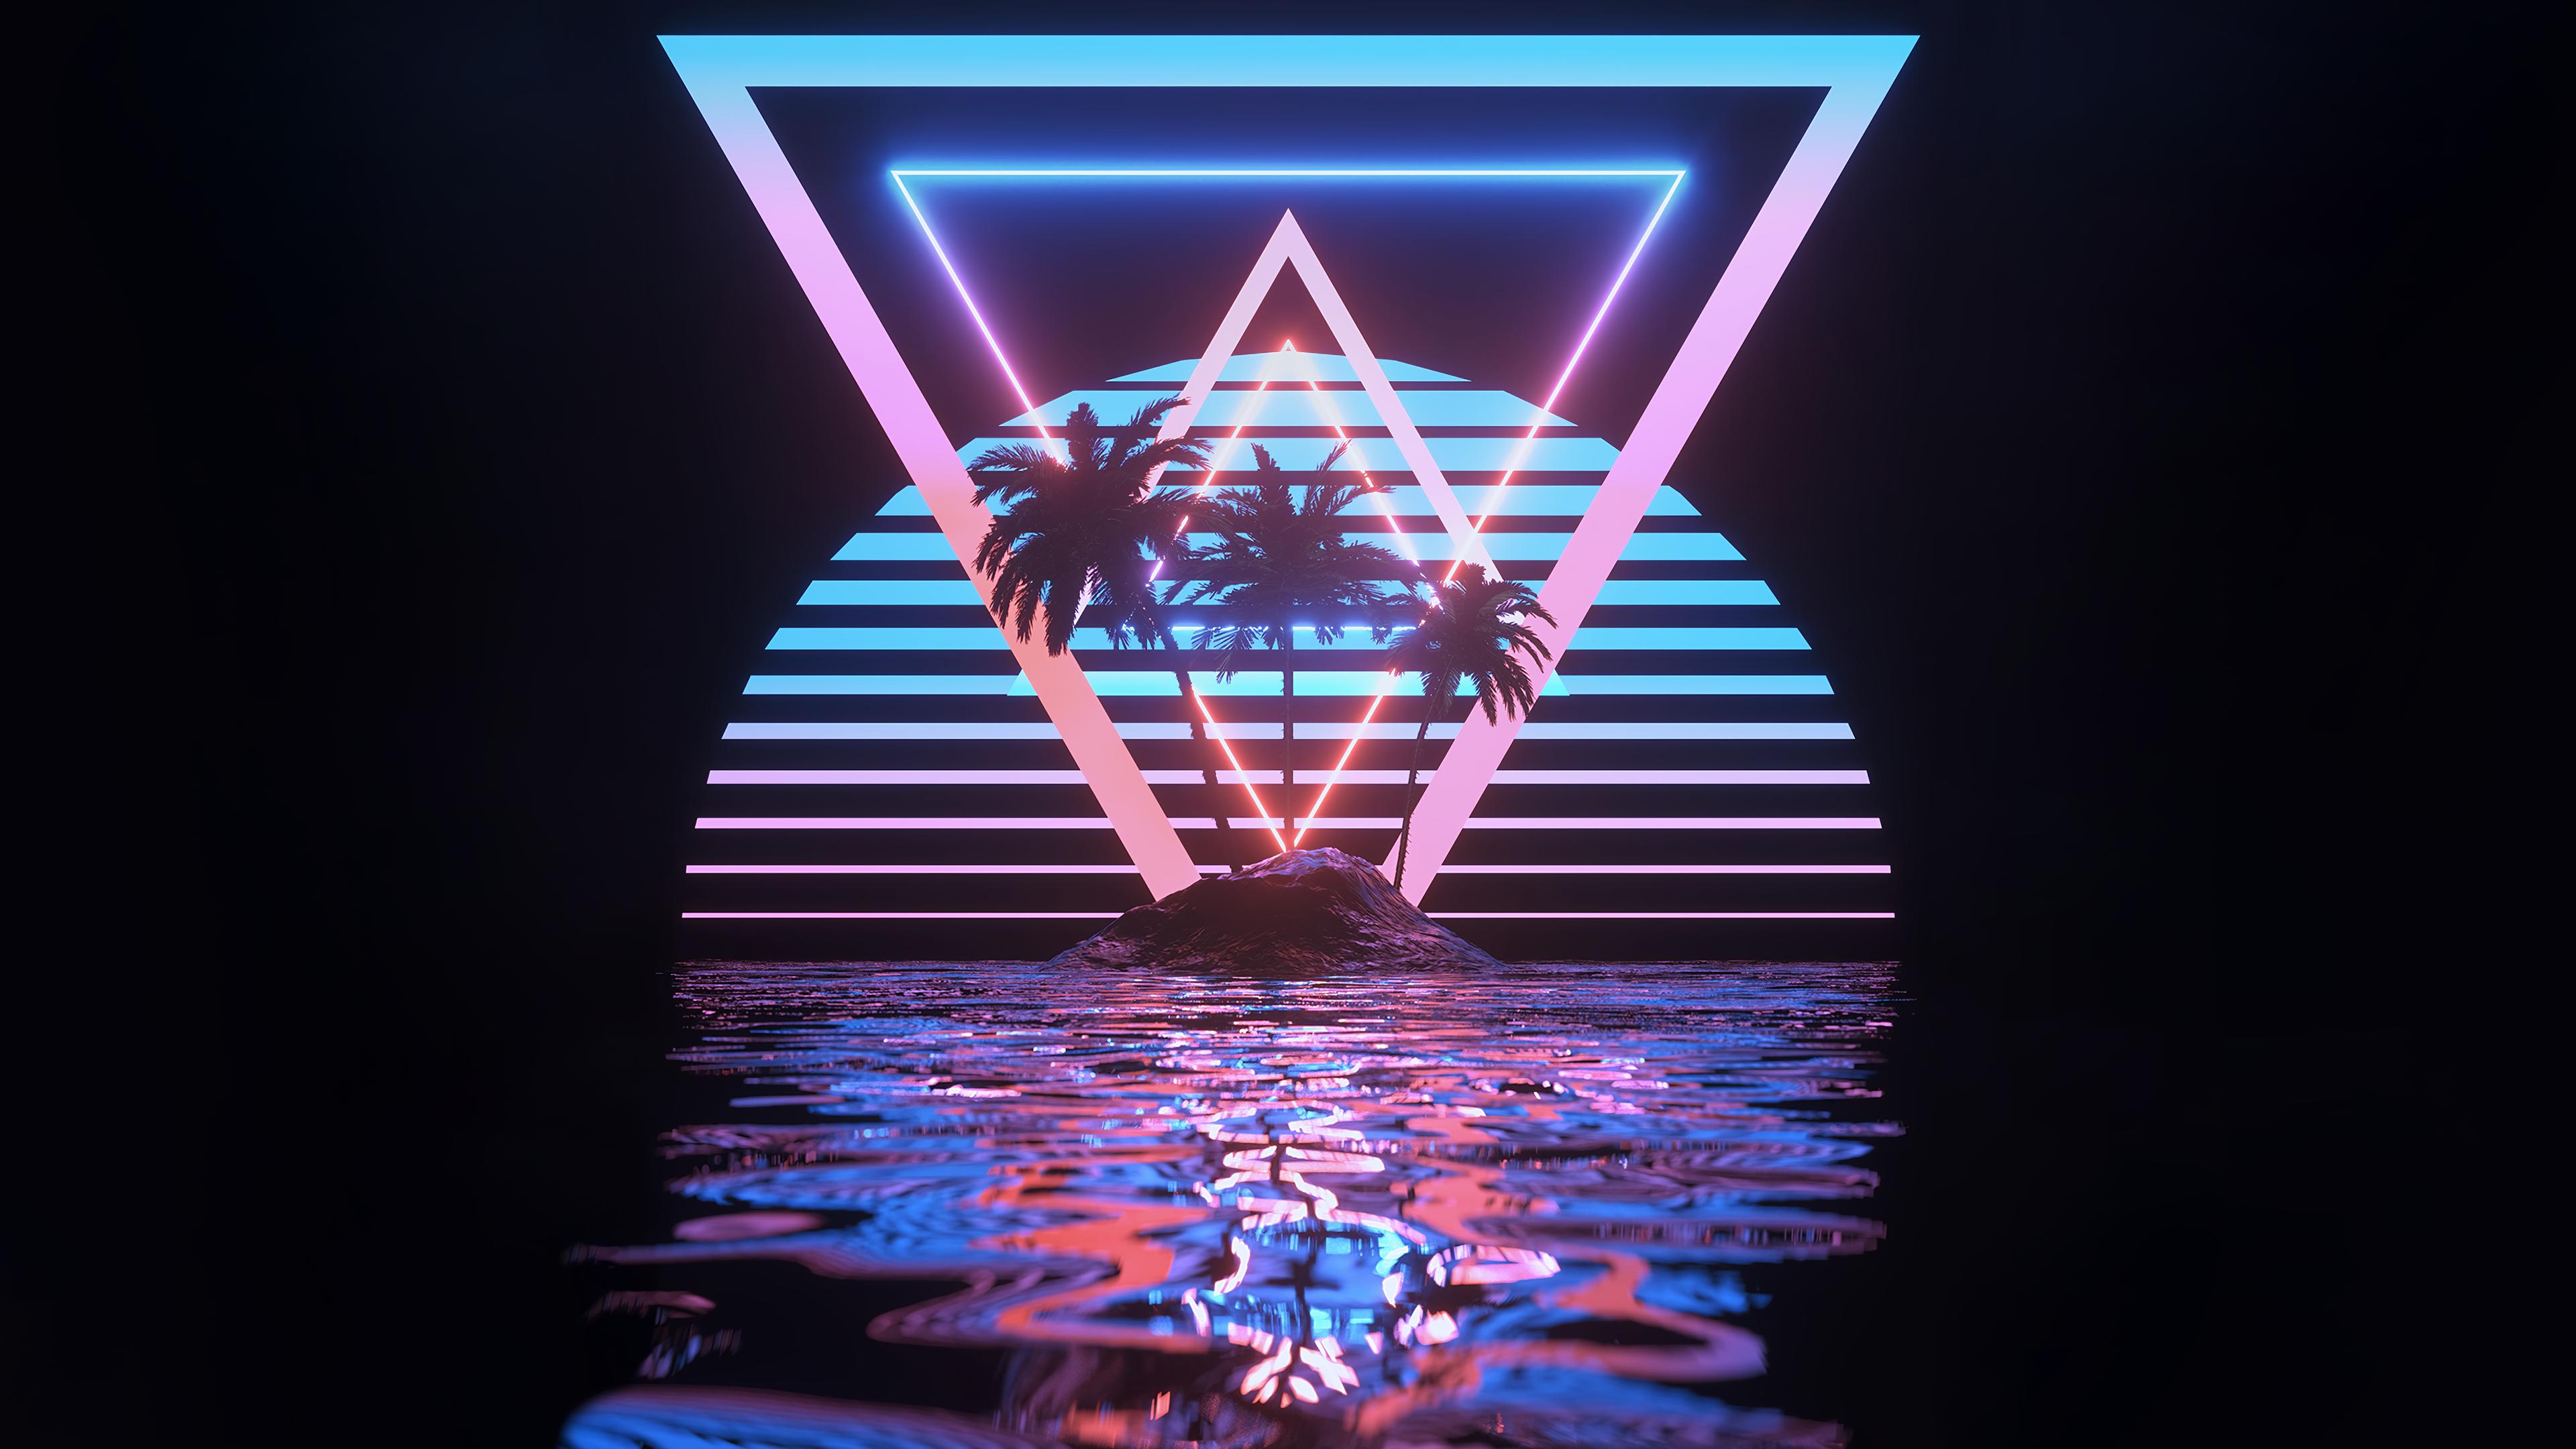 Tropical Paradise 3840x2160 Vaporwave Wallpaper Neon Wallpaper Heaven Wallpaper